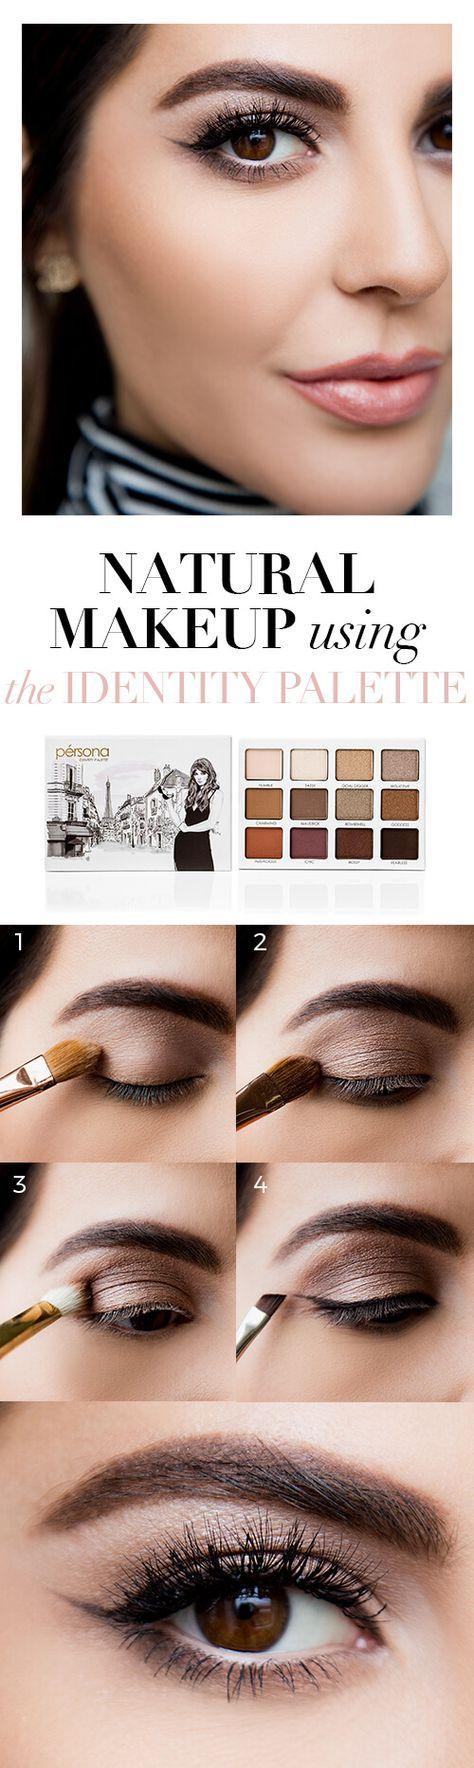 Sona Gasparian's Natural Eye Makeup Tutorial using the Pérsona Cosmetics Id...